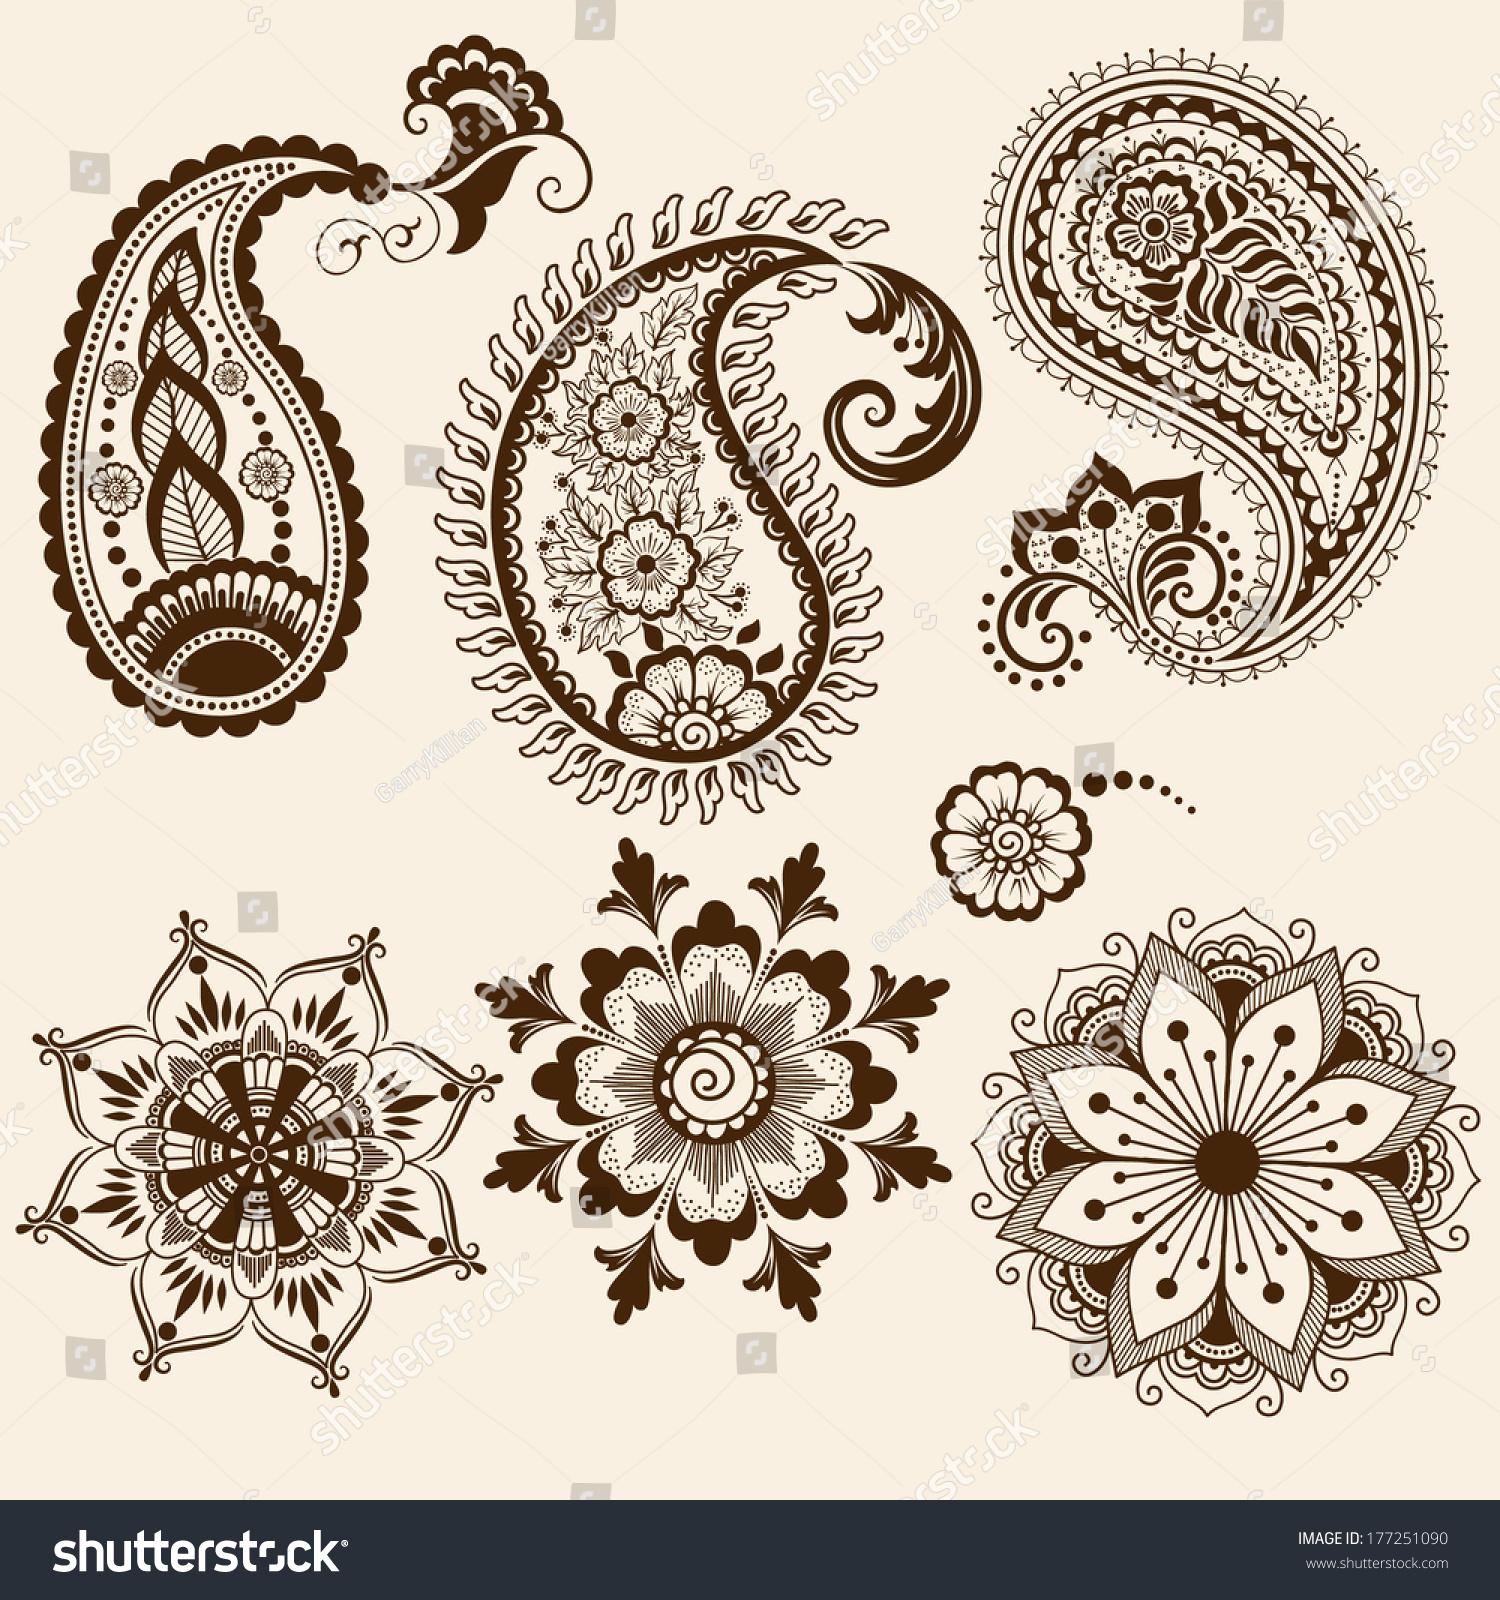 Set Of Black Flower Design Elements Vector Illustration: Set Vector Abstract Floral Elements Indian Stock Vector